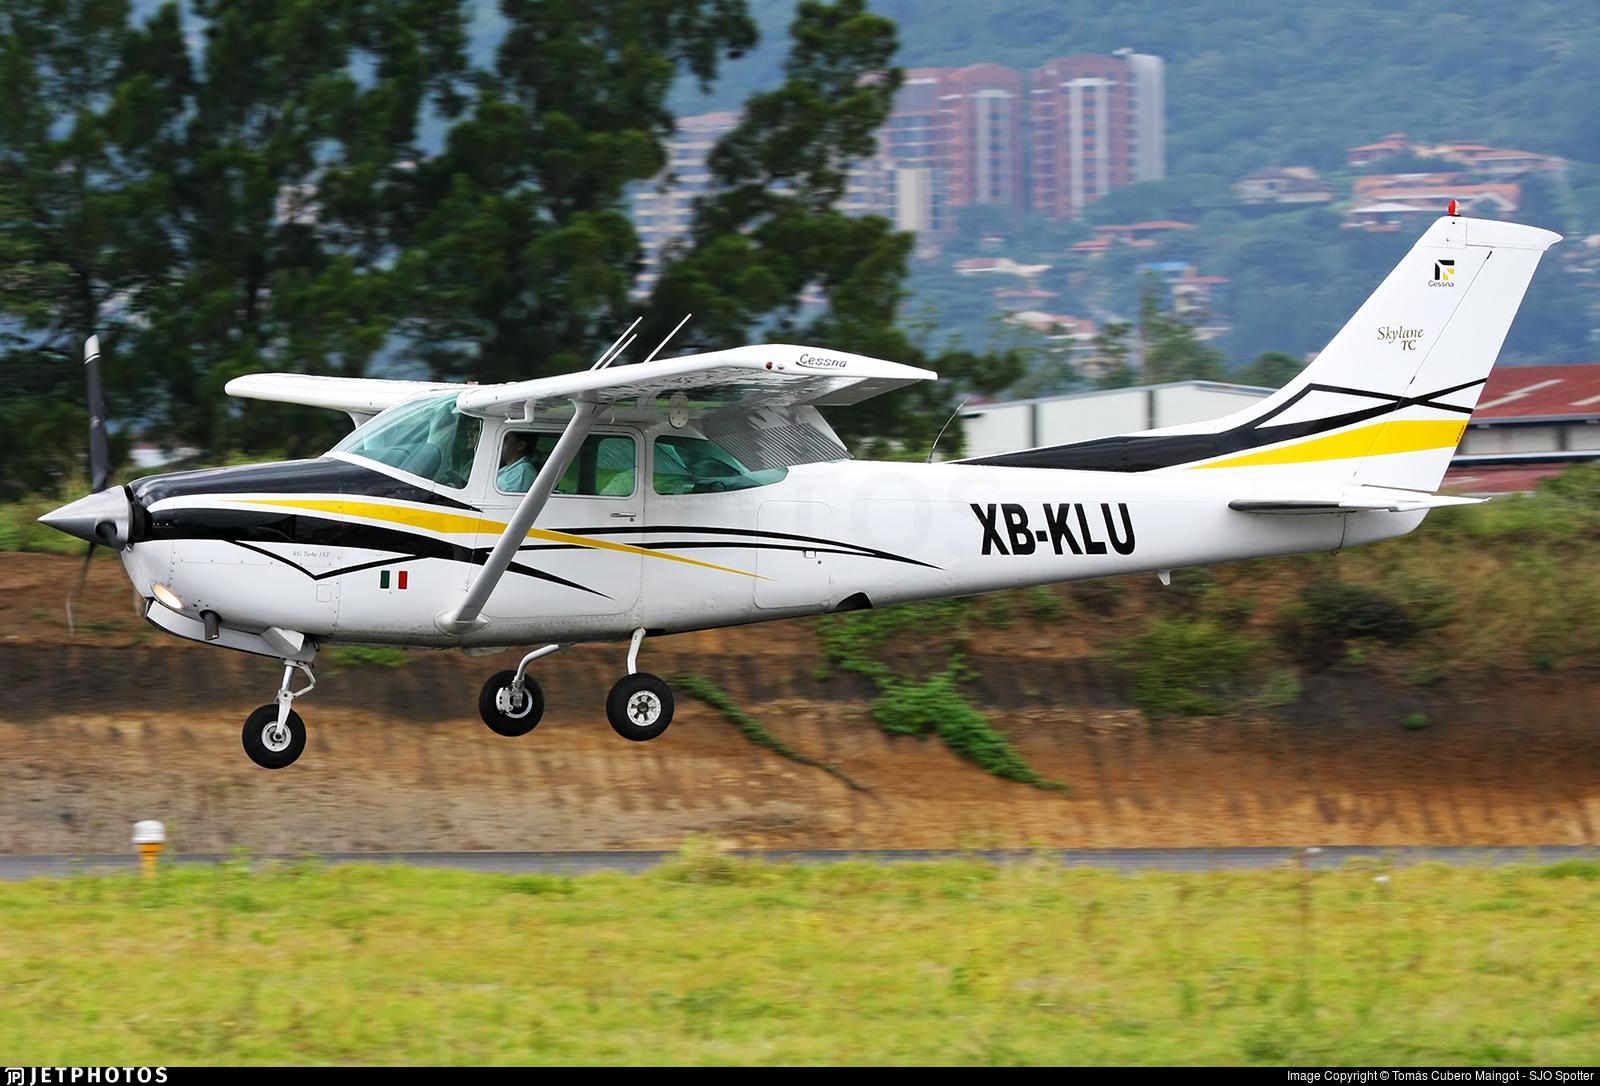 XB-KLU - Cessna TR182 Turbo Skylane RG - Private